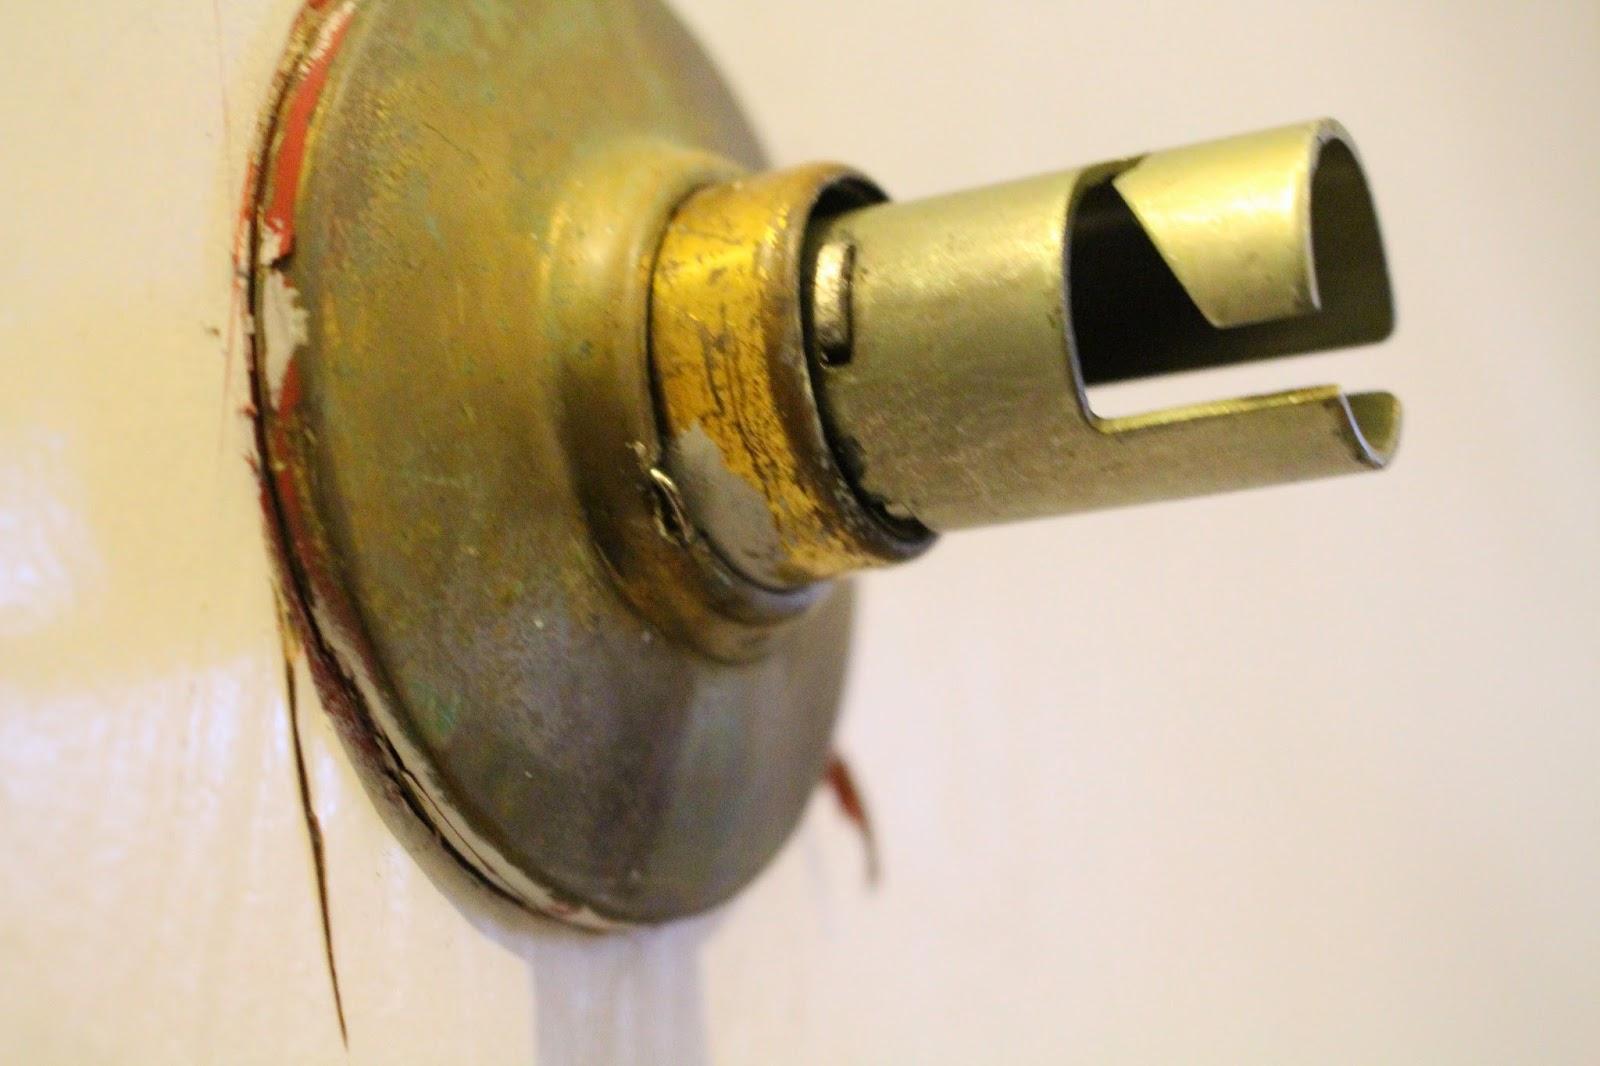 Life On Elizabeth: How to Remove an Old Door Knob